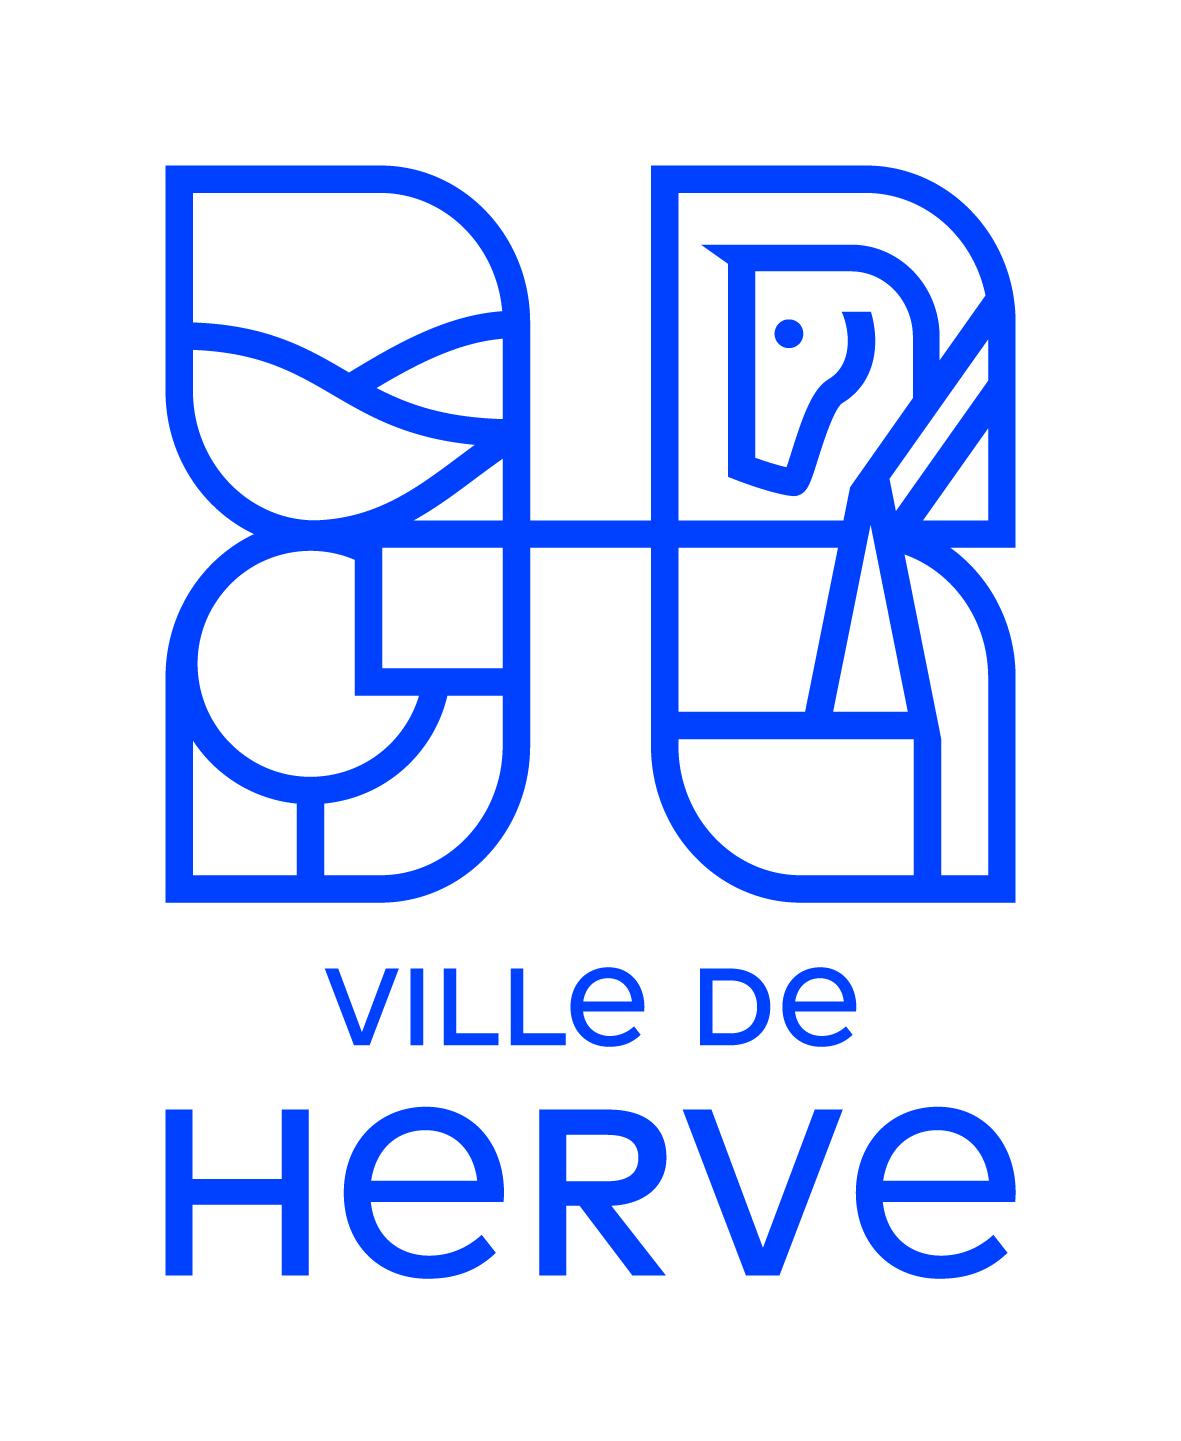 image Herve_LogoOfficiel_BleuQuadri_Synthese.jpg (0.3MB)